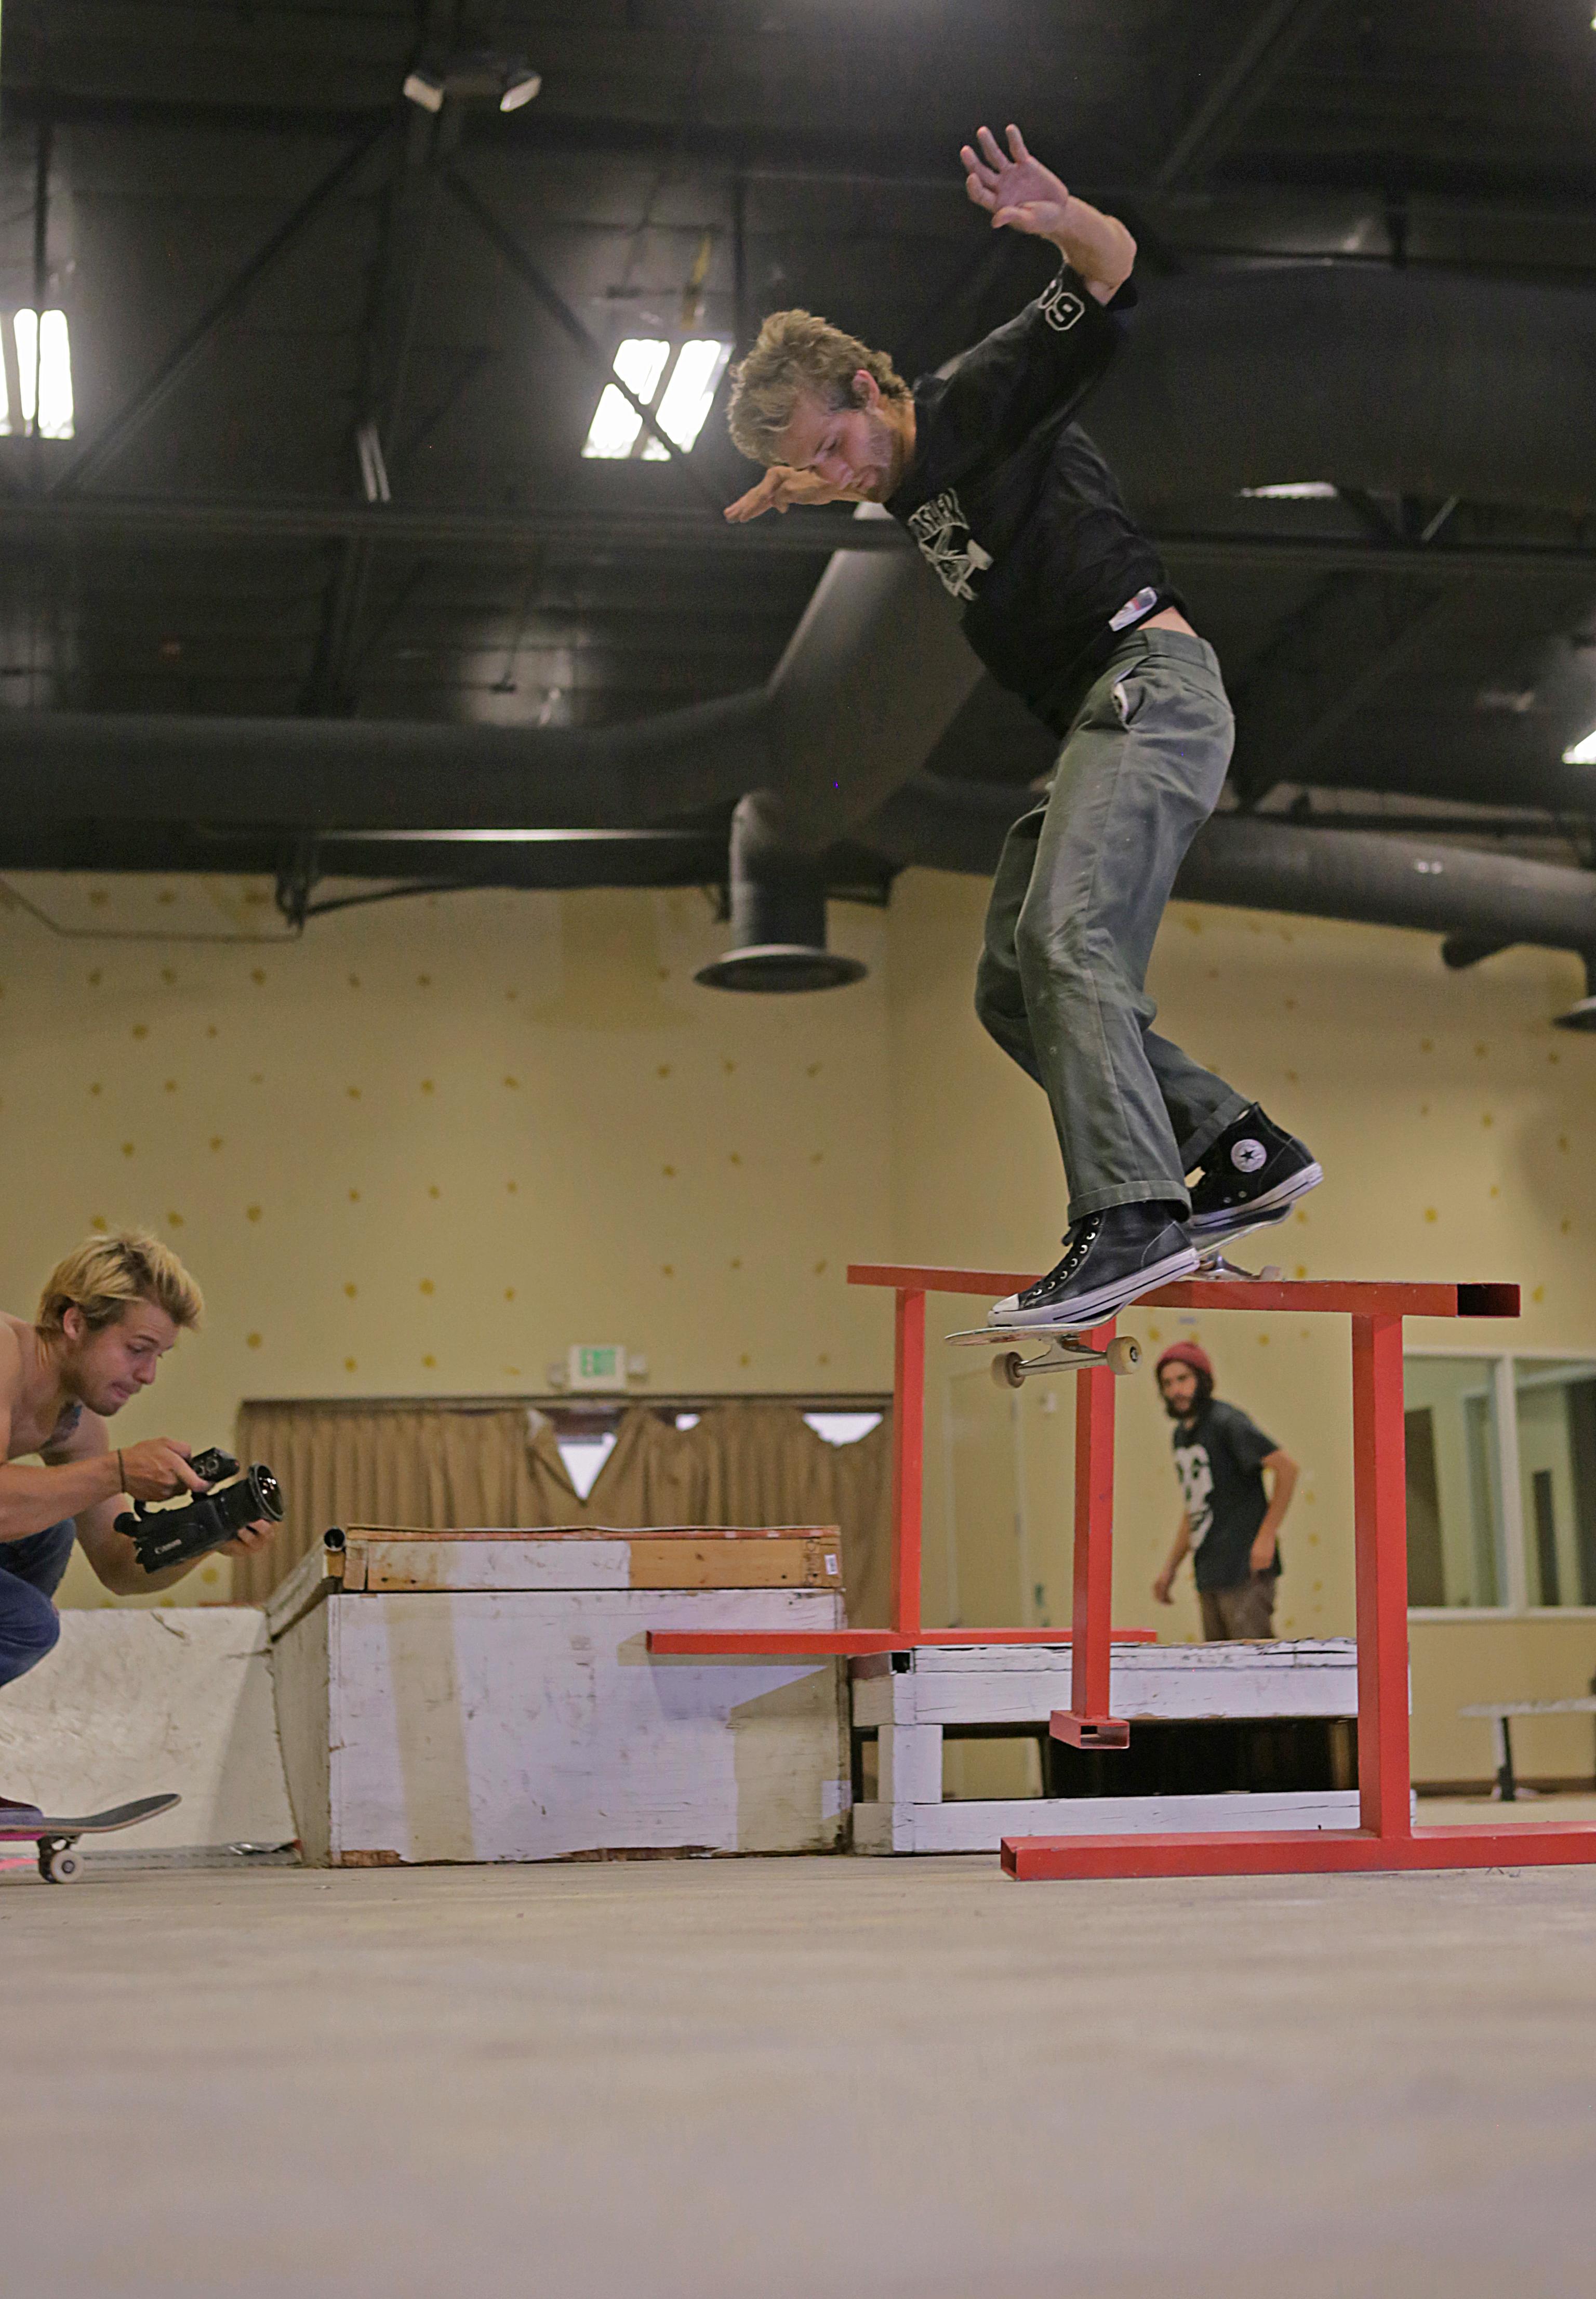 MItch Haight bs smith at Skate Church